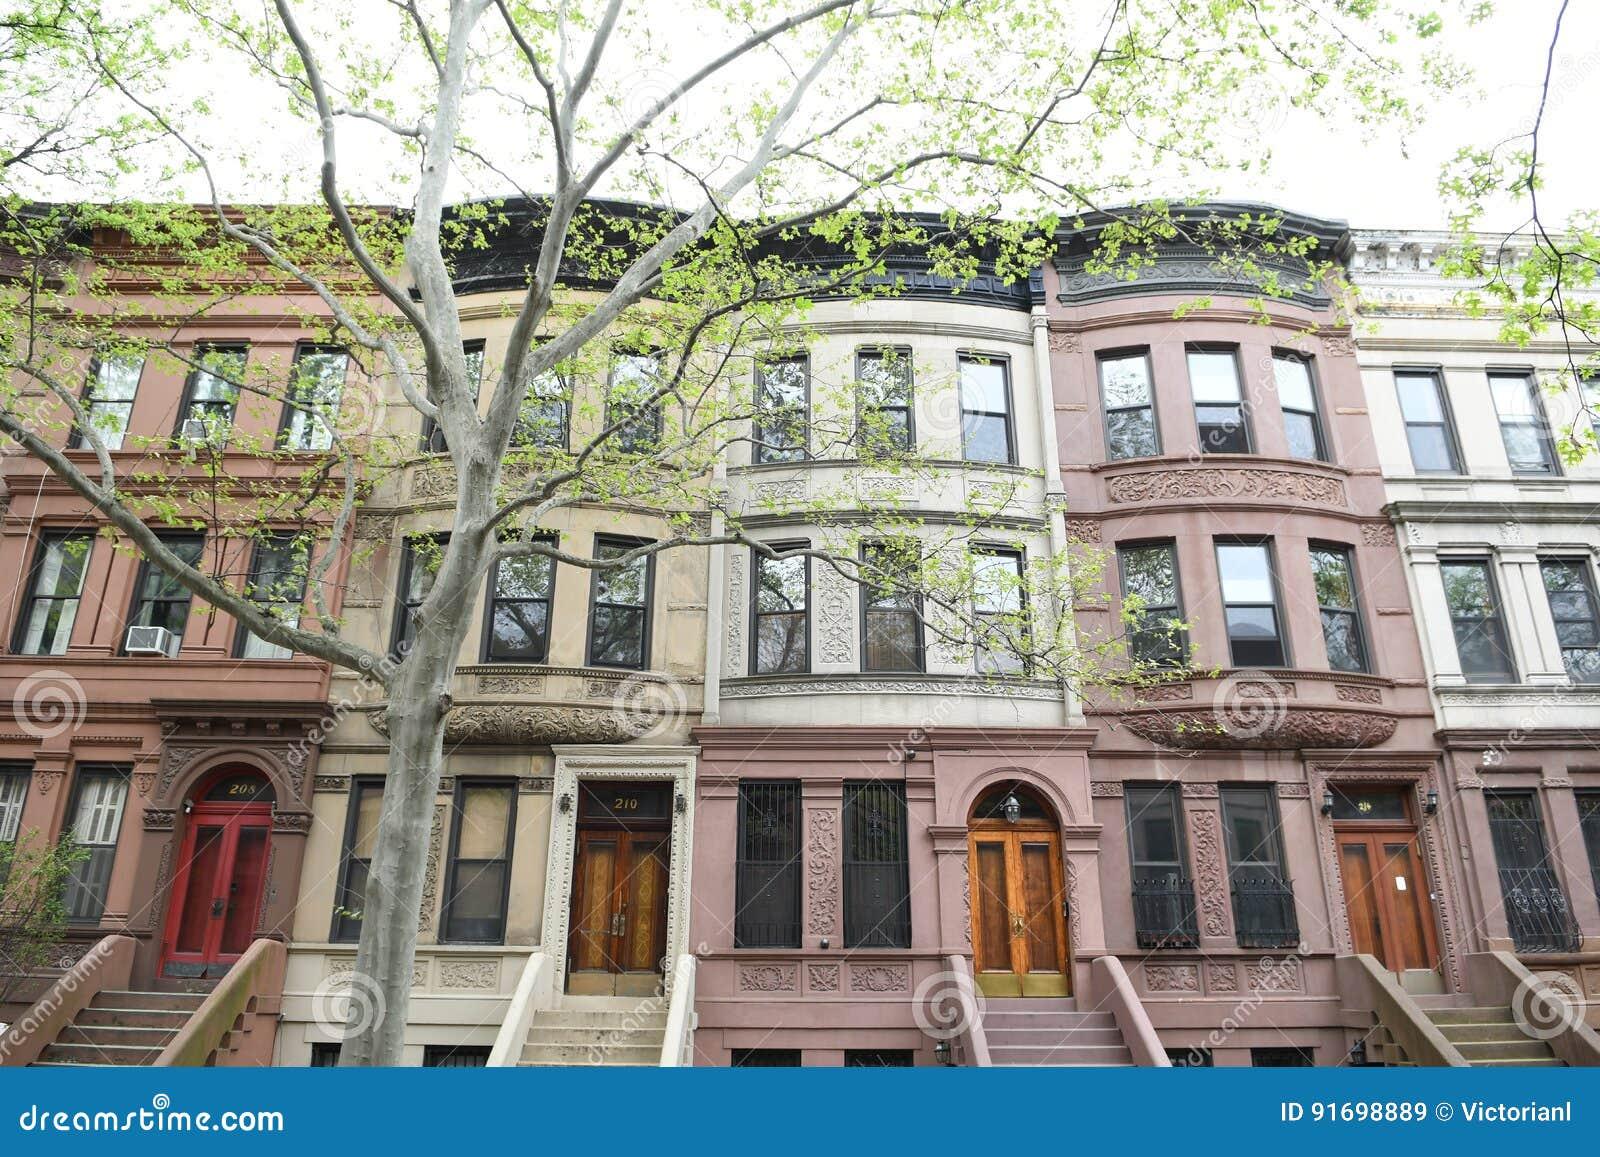 Harlem del oeste, New York City